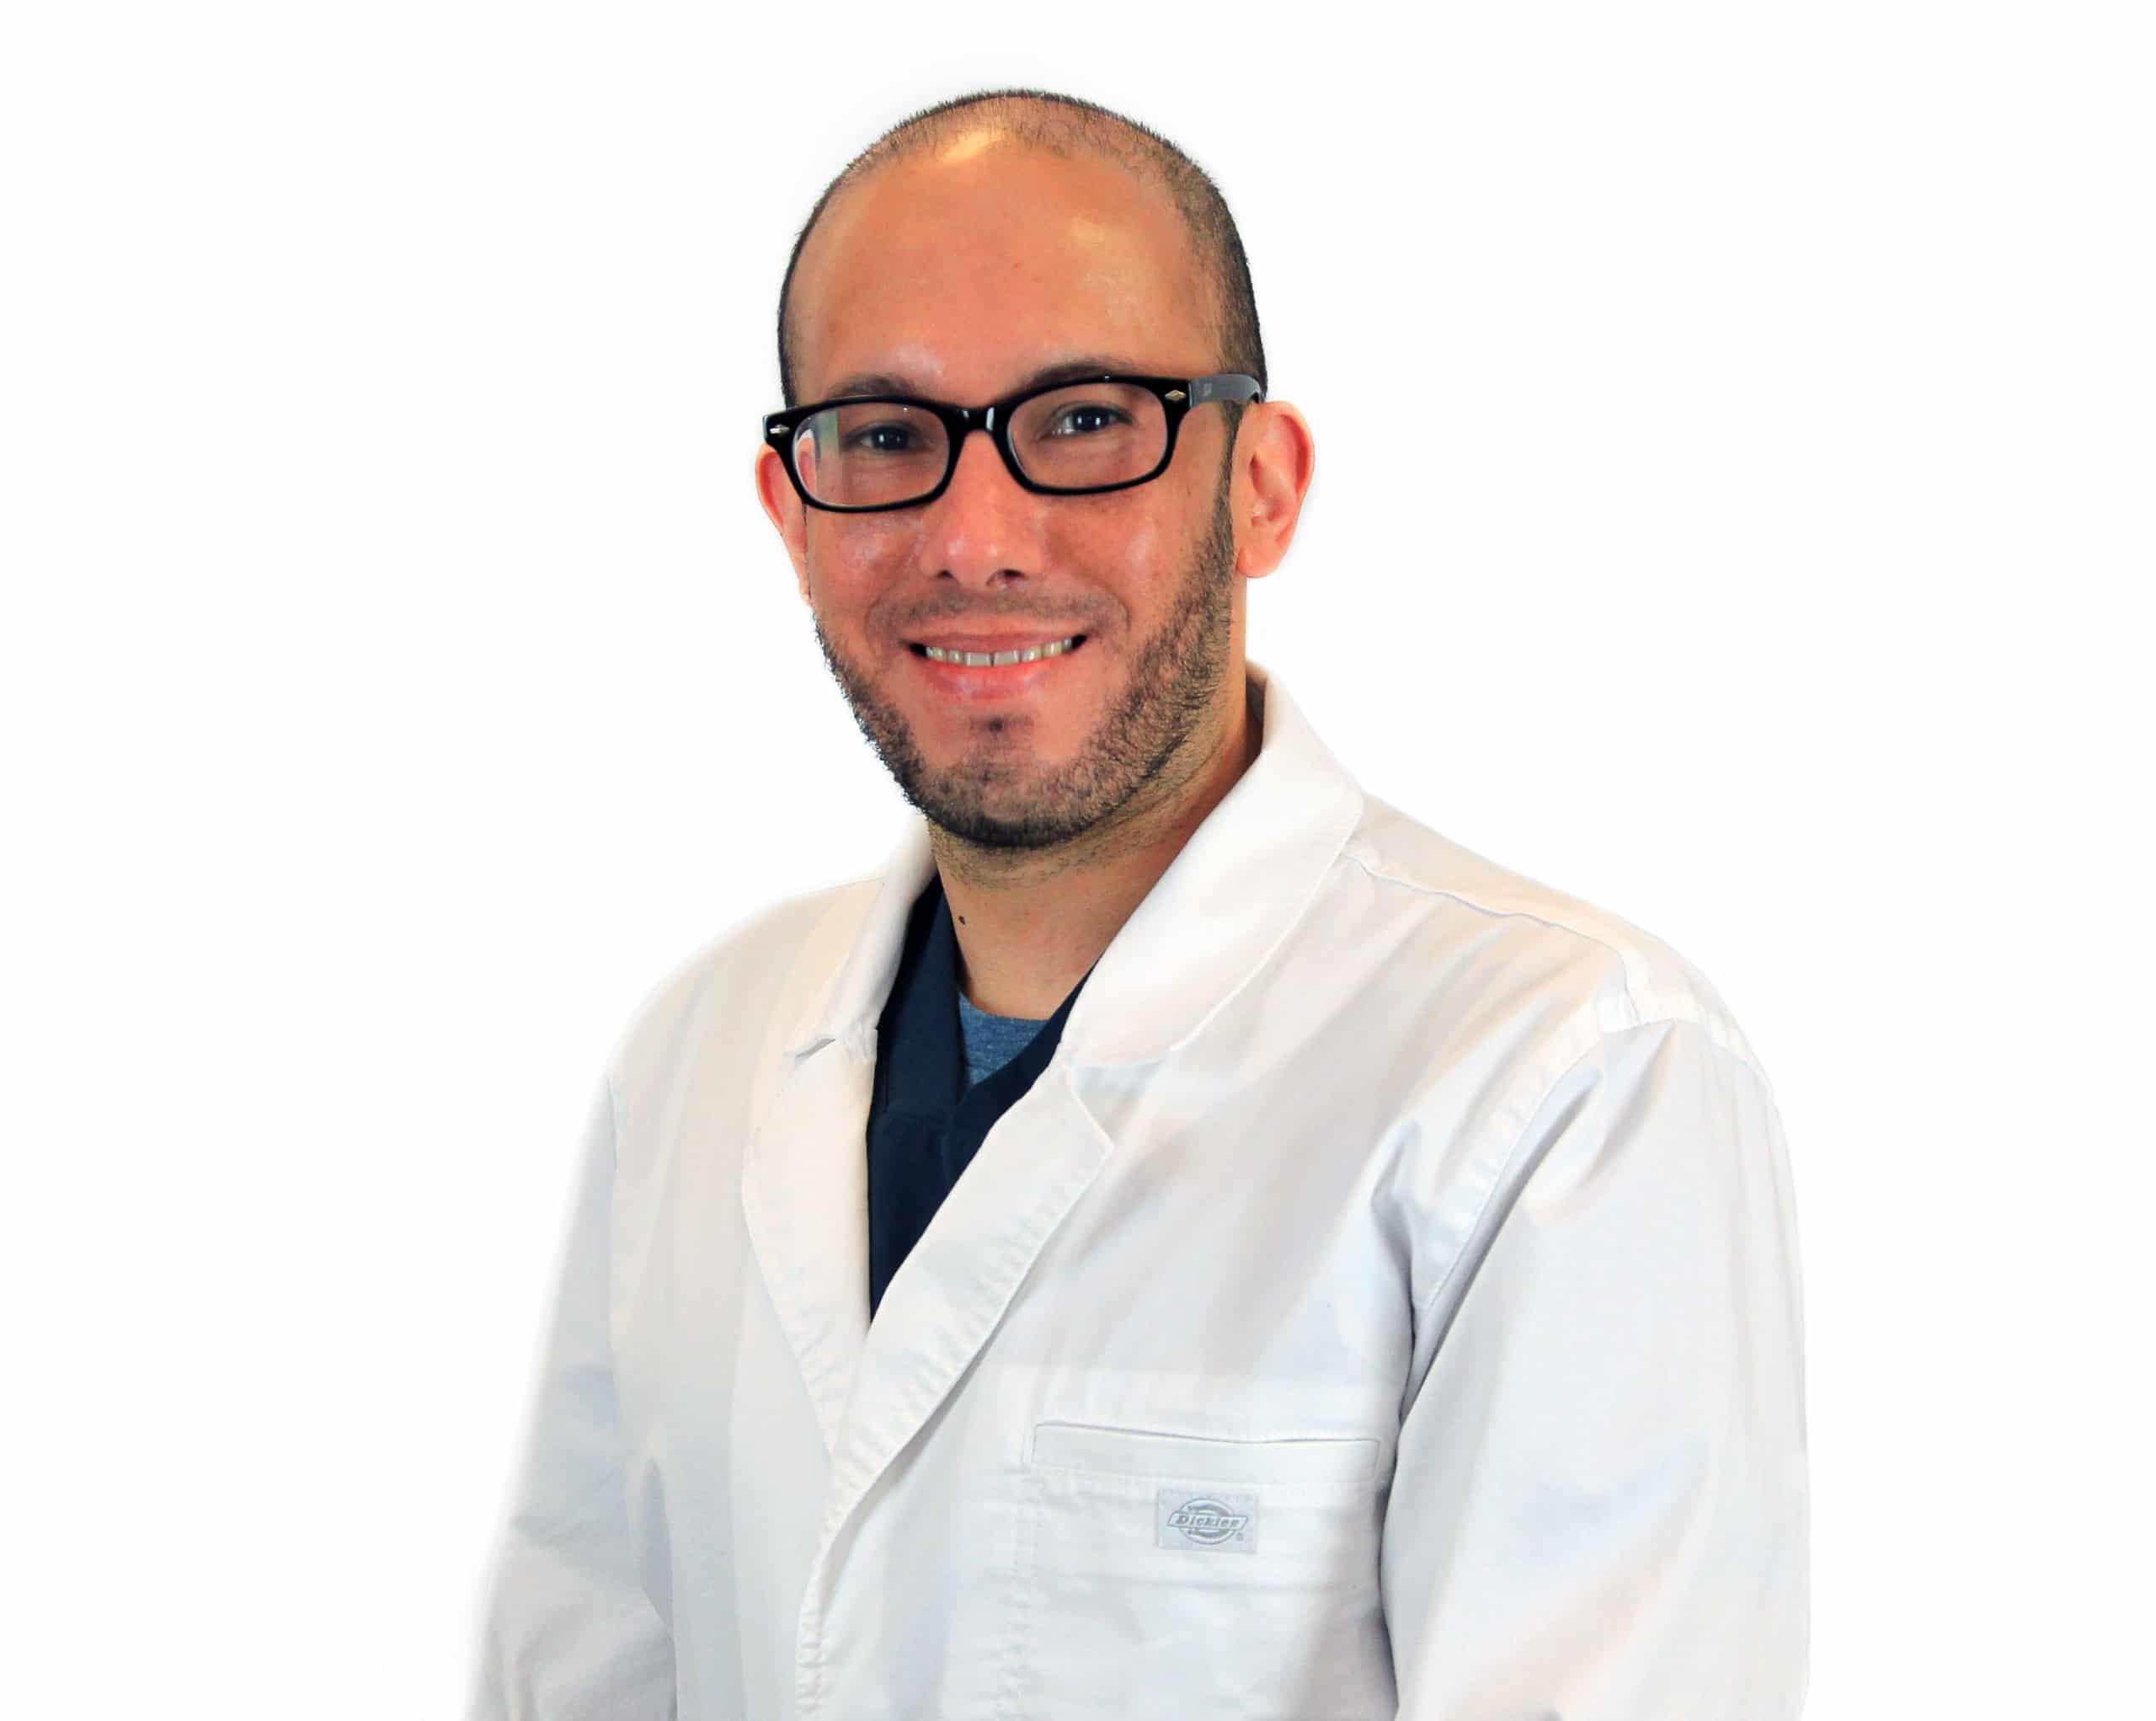 Michael Patino